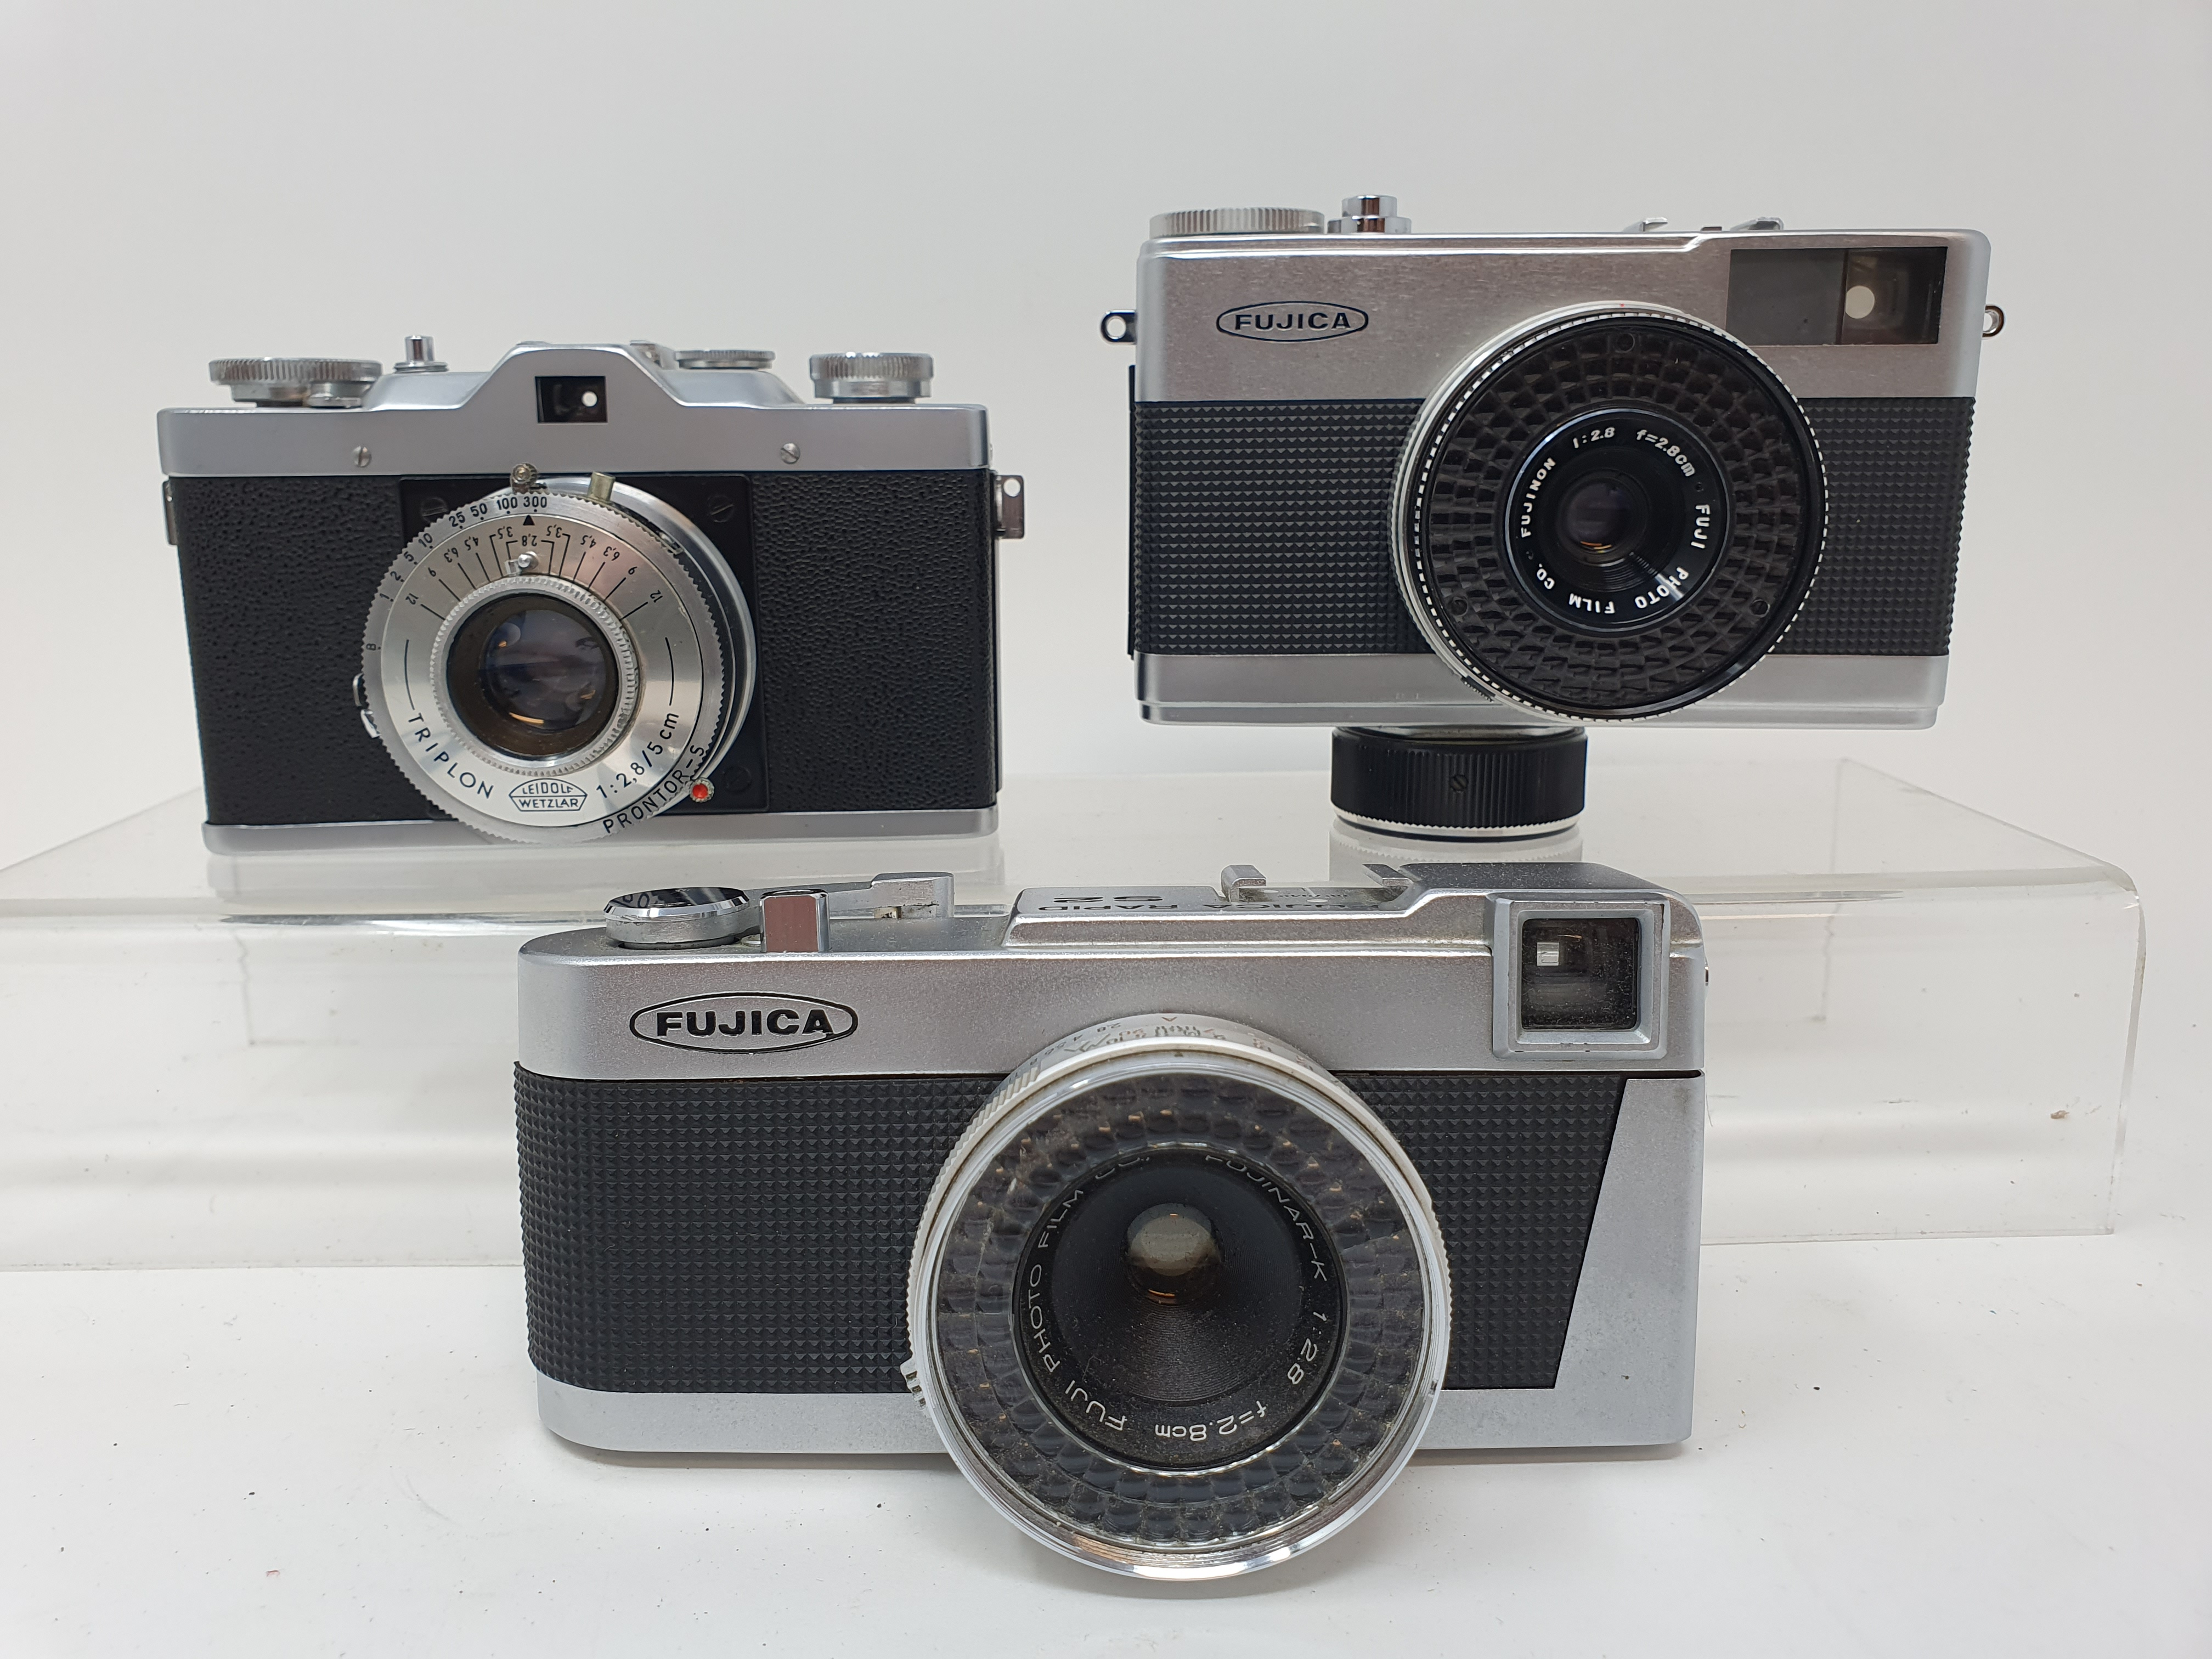 A Leidolf Lord OX camera, Fujica Rapid D1 camera and a Fujica Rapid S2 camera (3) Provenance: Part